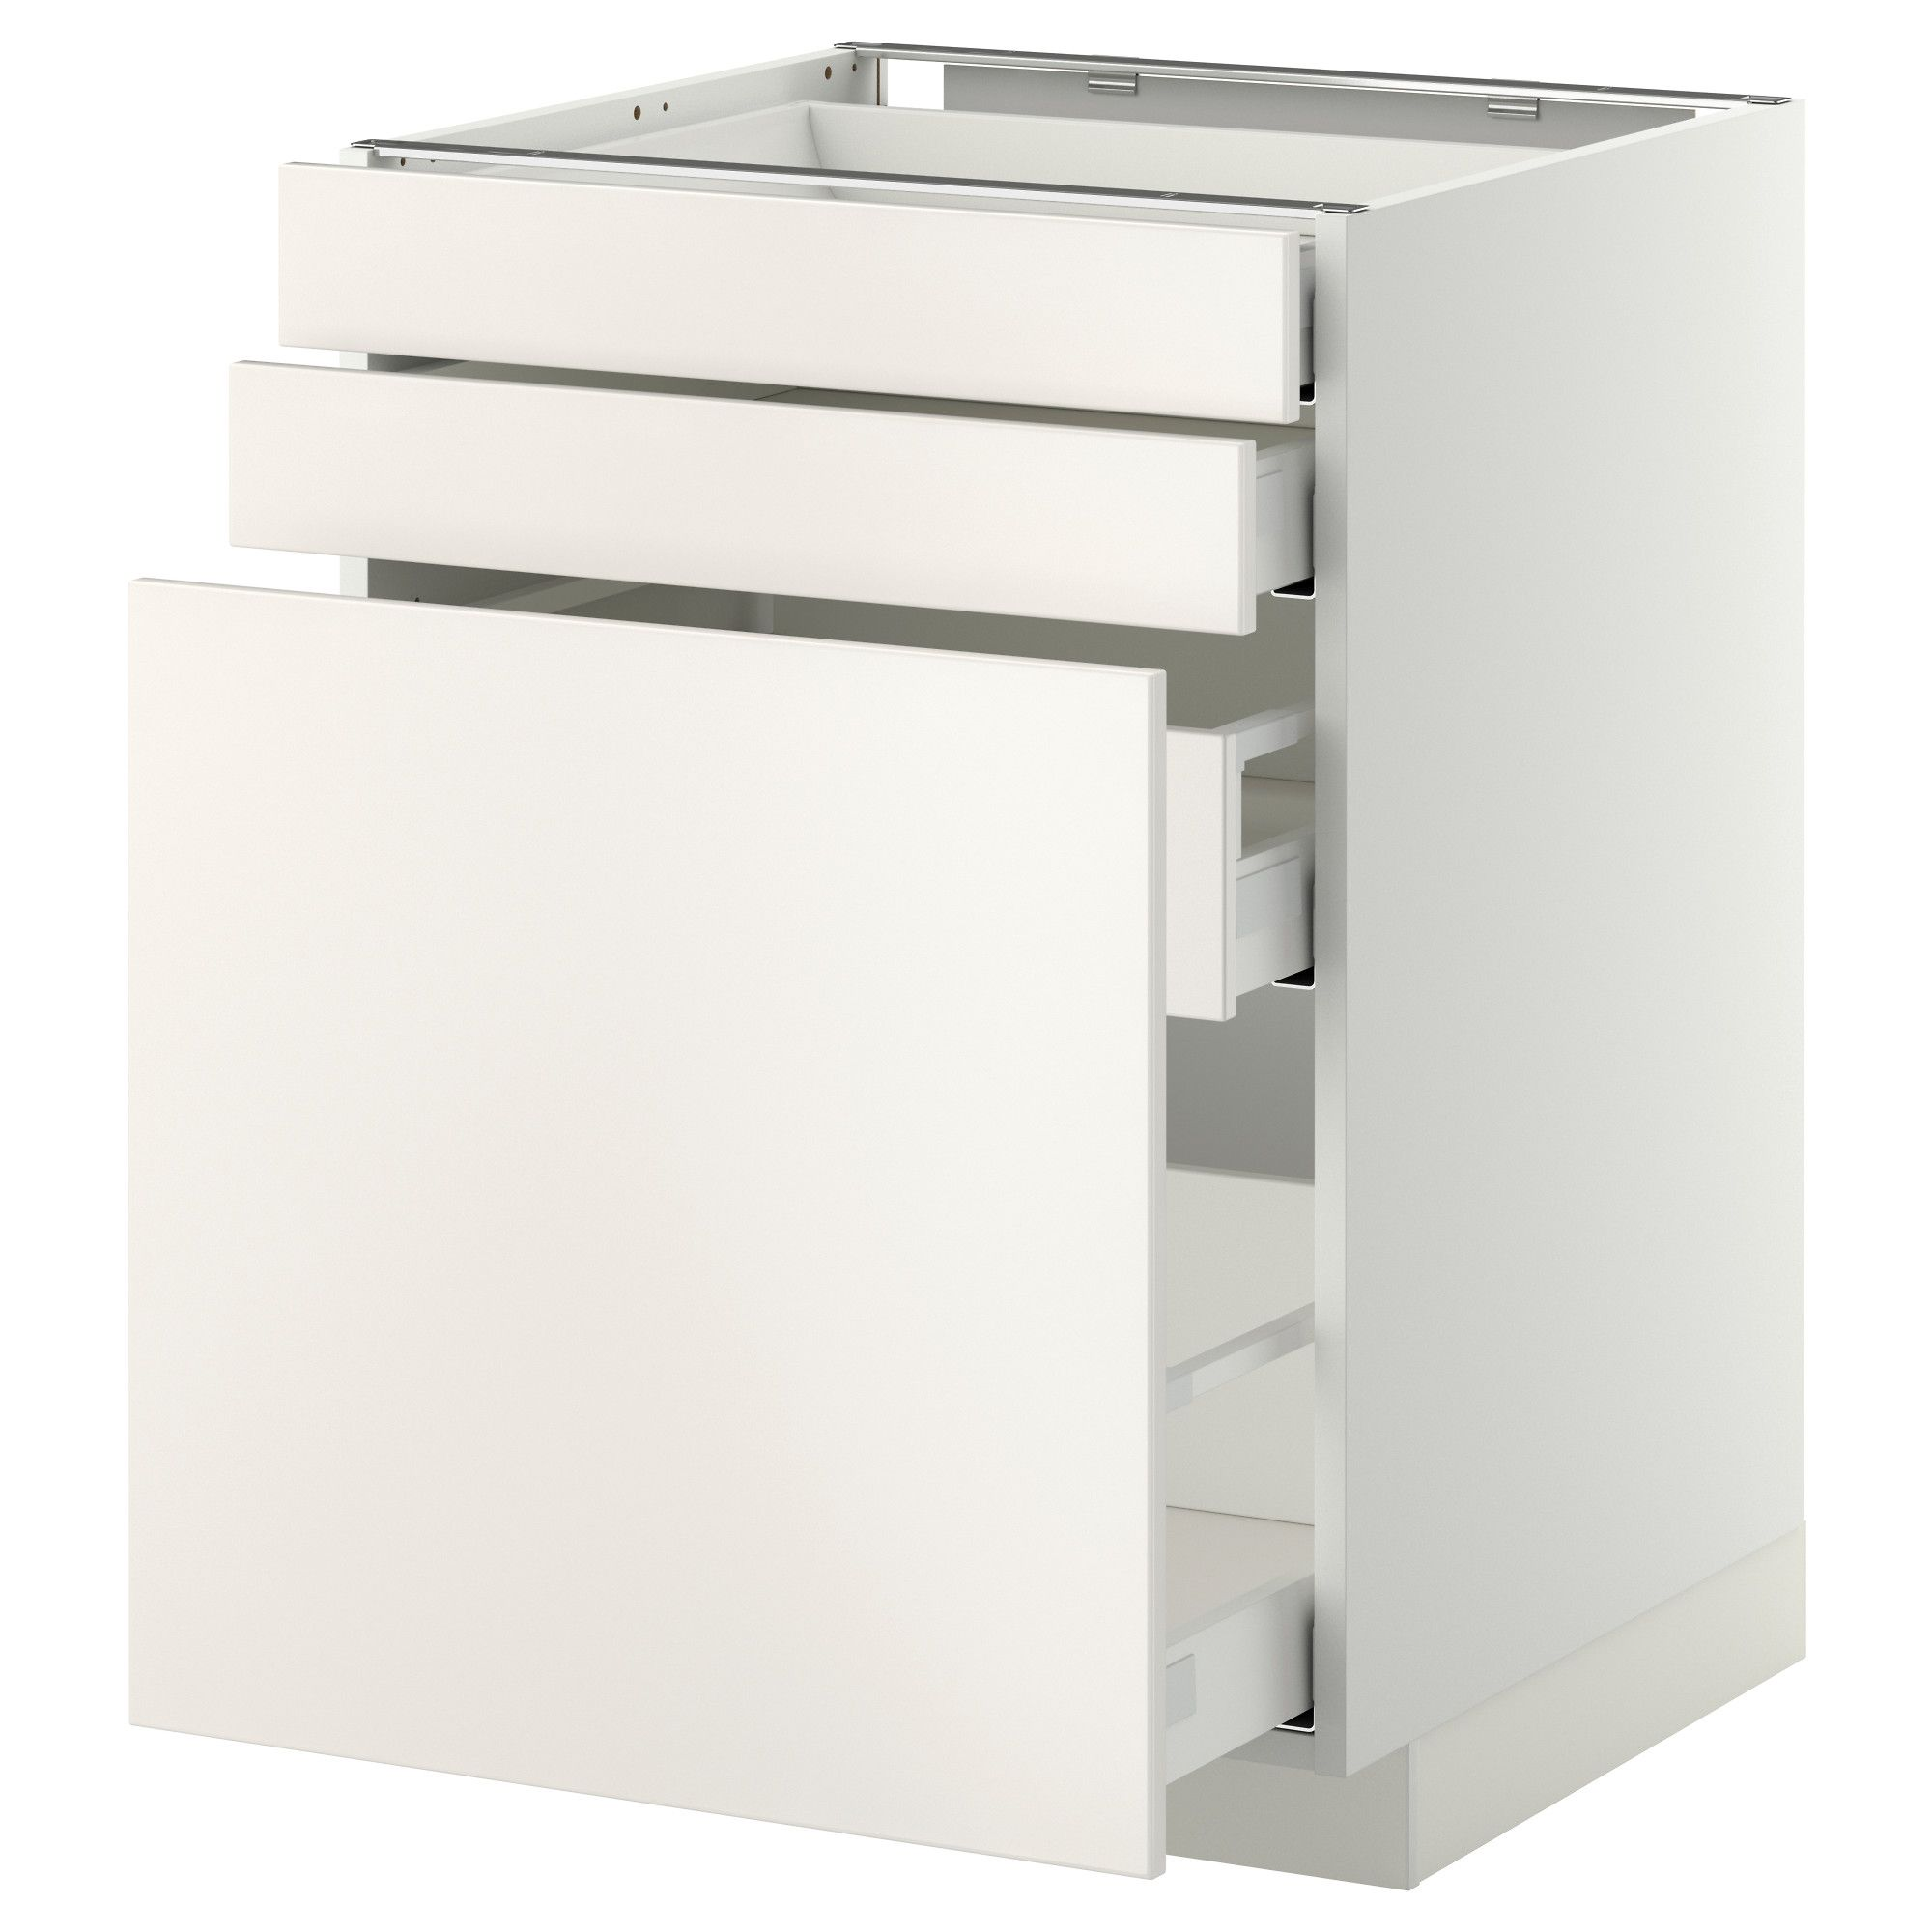 Metod maximera mobile cestelli dispensa 2 frontali bianco veddinge bianco 60x60 cm ikea - Ikea mobile dispensa ...